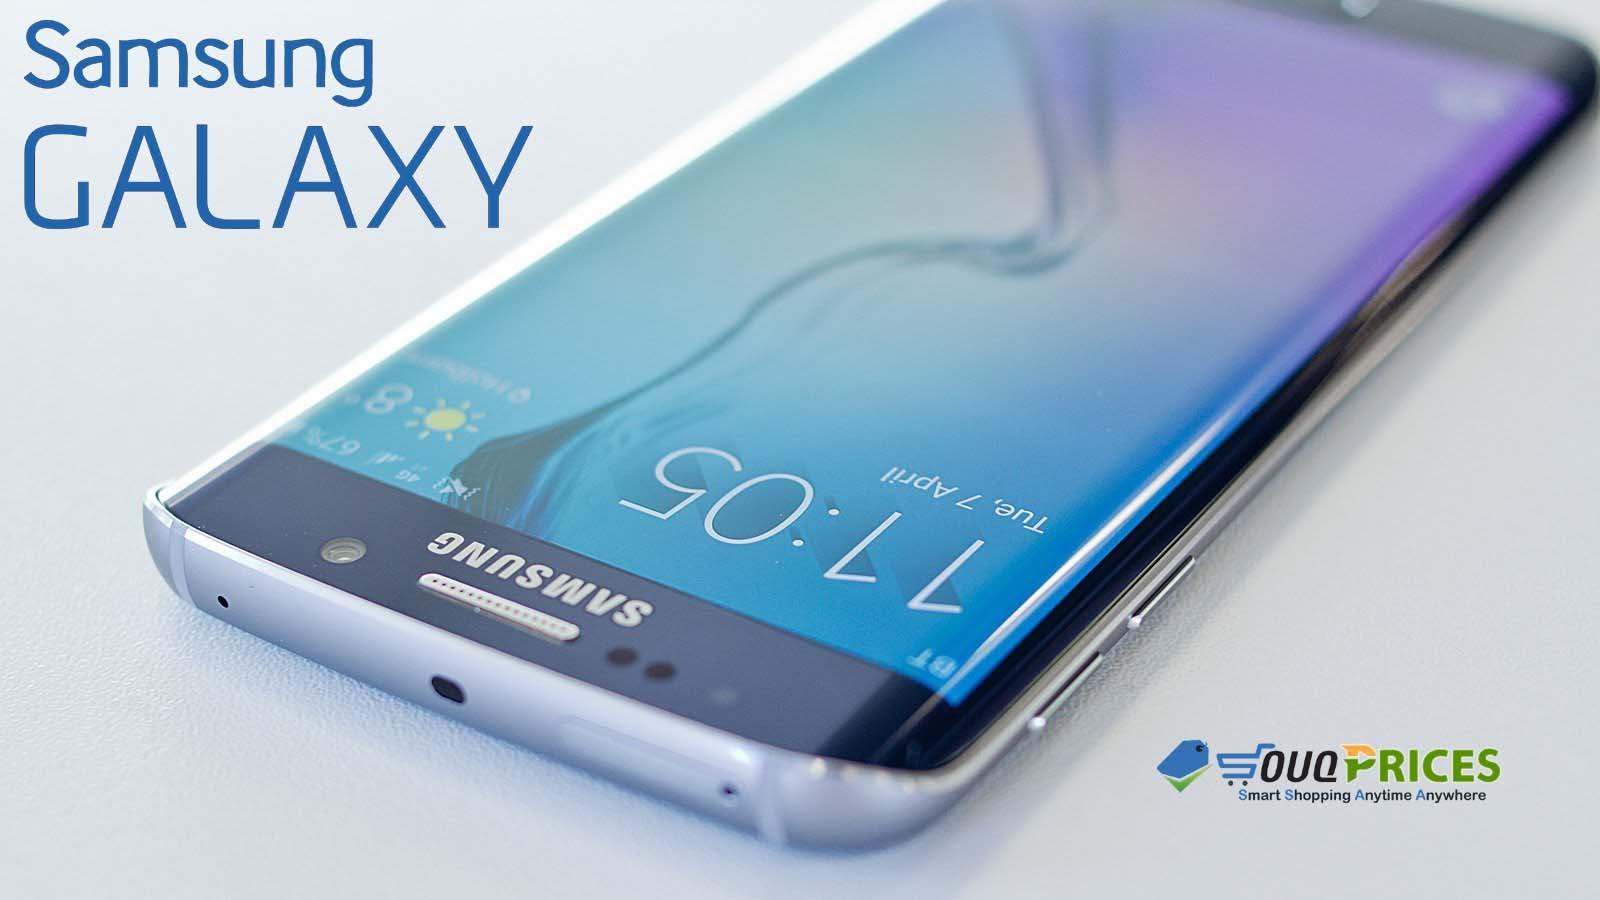 Top 12 Galaxy S7 Edge Plus Price In Uae - Gorgeous Tiny